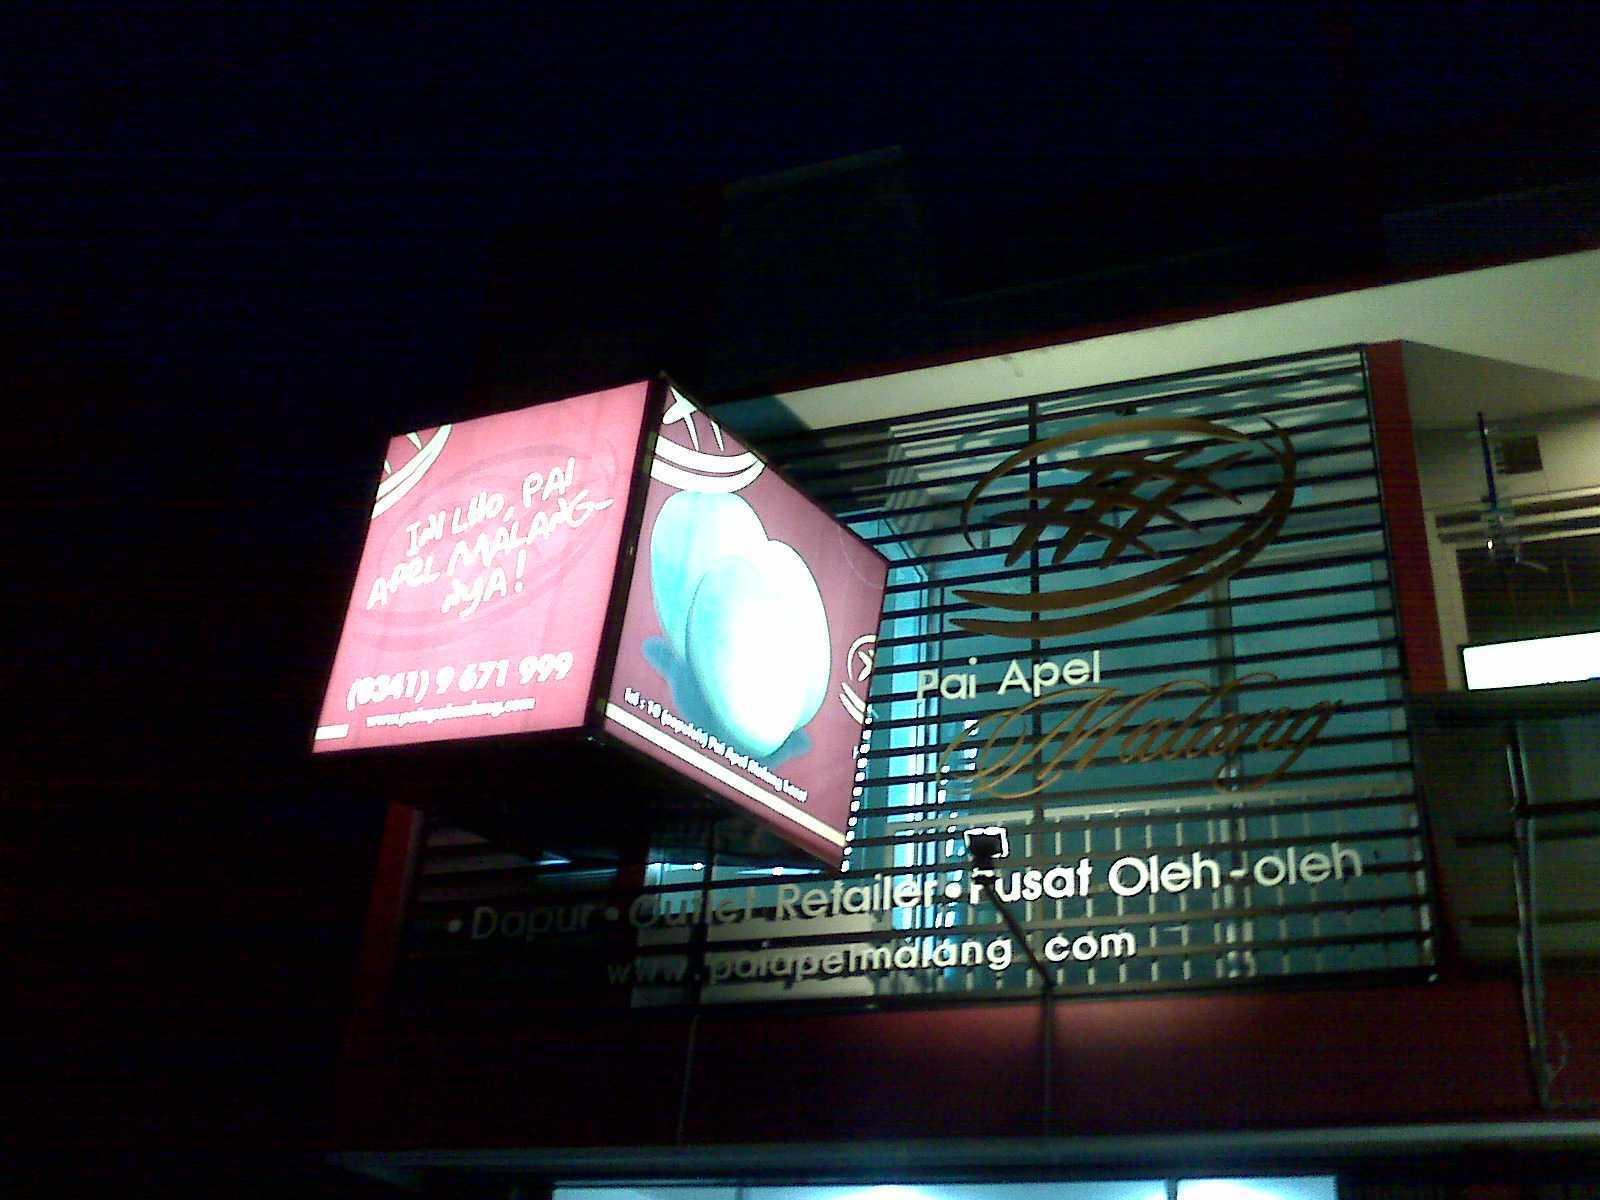 Josaf Sayoko Pai Apel Malang Jl. Raden Tumenggung Suryo, Bunulrejo, Blimbing, Kota Malang, Jawa Timur, Indonesia Jl. Raden Tumenggung Suryo, Bunulrejo, Blimbing, Kota Malang, Jawa Timur, Indonesia Josaf-Sayoko-Pai-Apel-Malang  57643